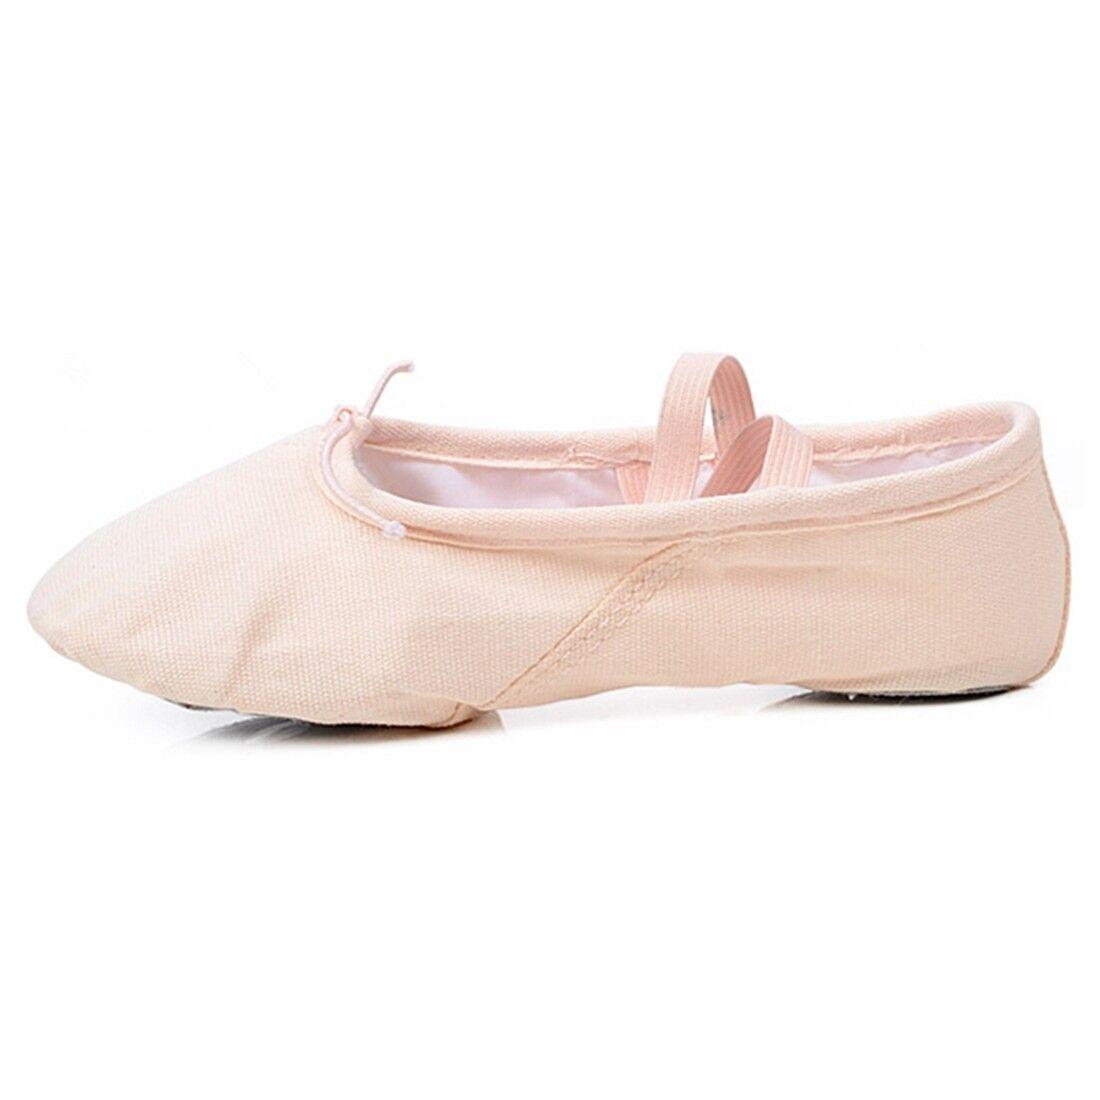 Toddler Girl /& Adult  Ballet Dance Split-Sole Fashion # 1 Canvas Slipper Shoes